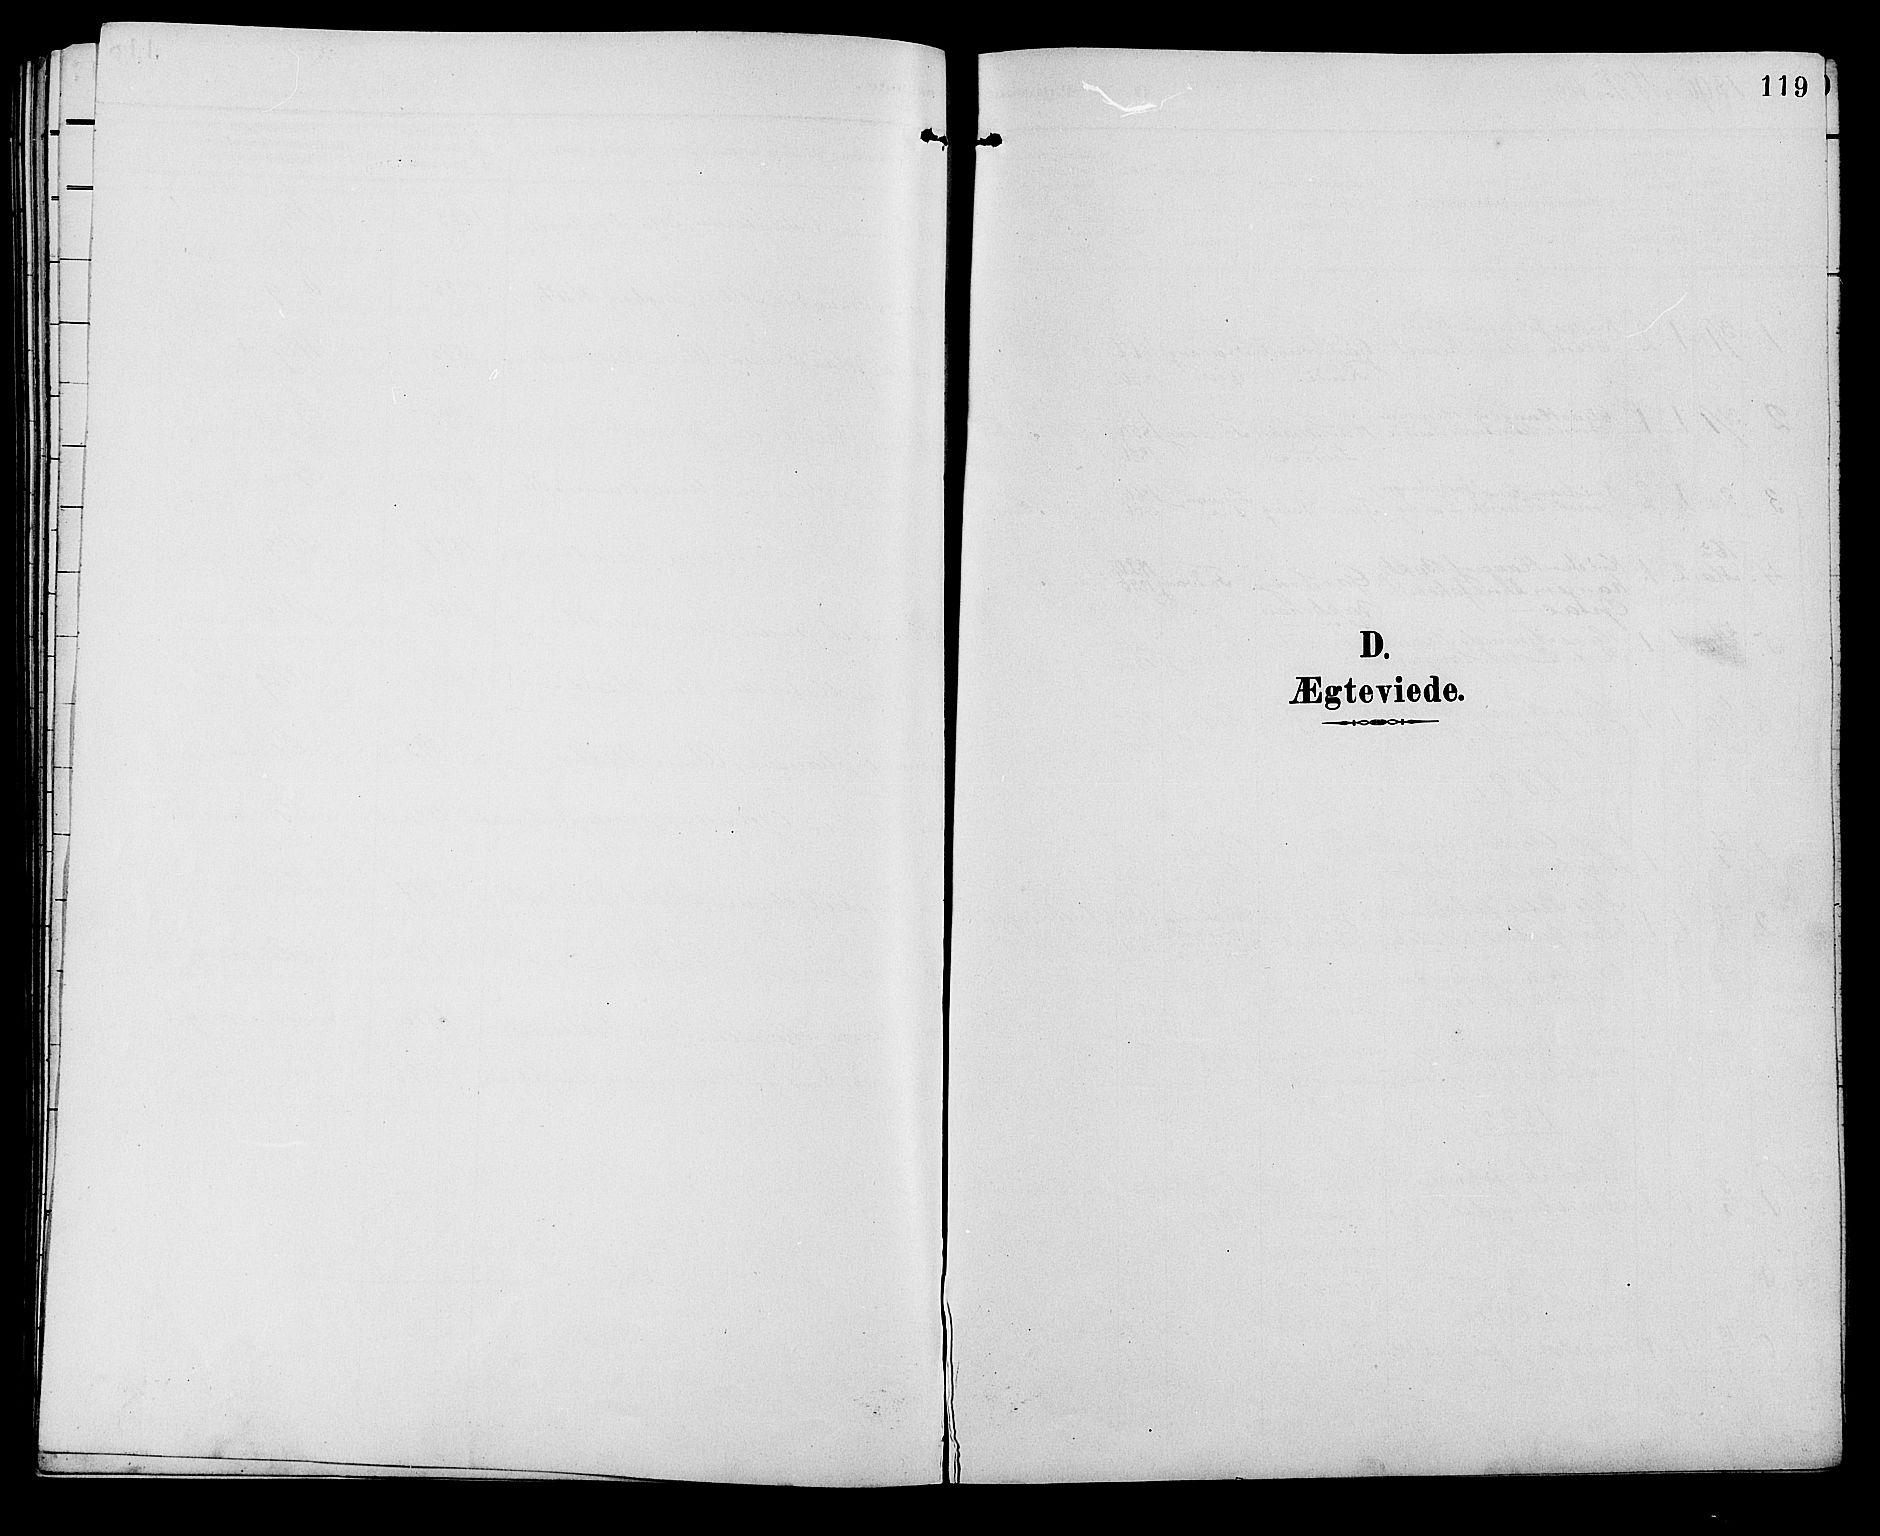 SAH, Ringebu prestekontor, Klokkerbok nr. 7, 1890-1910, s. 119